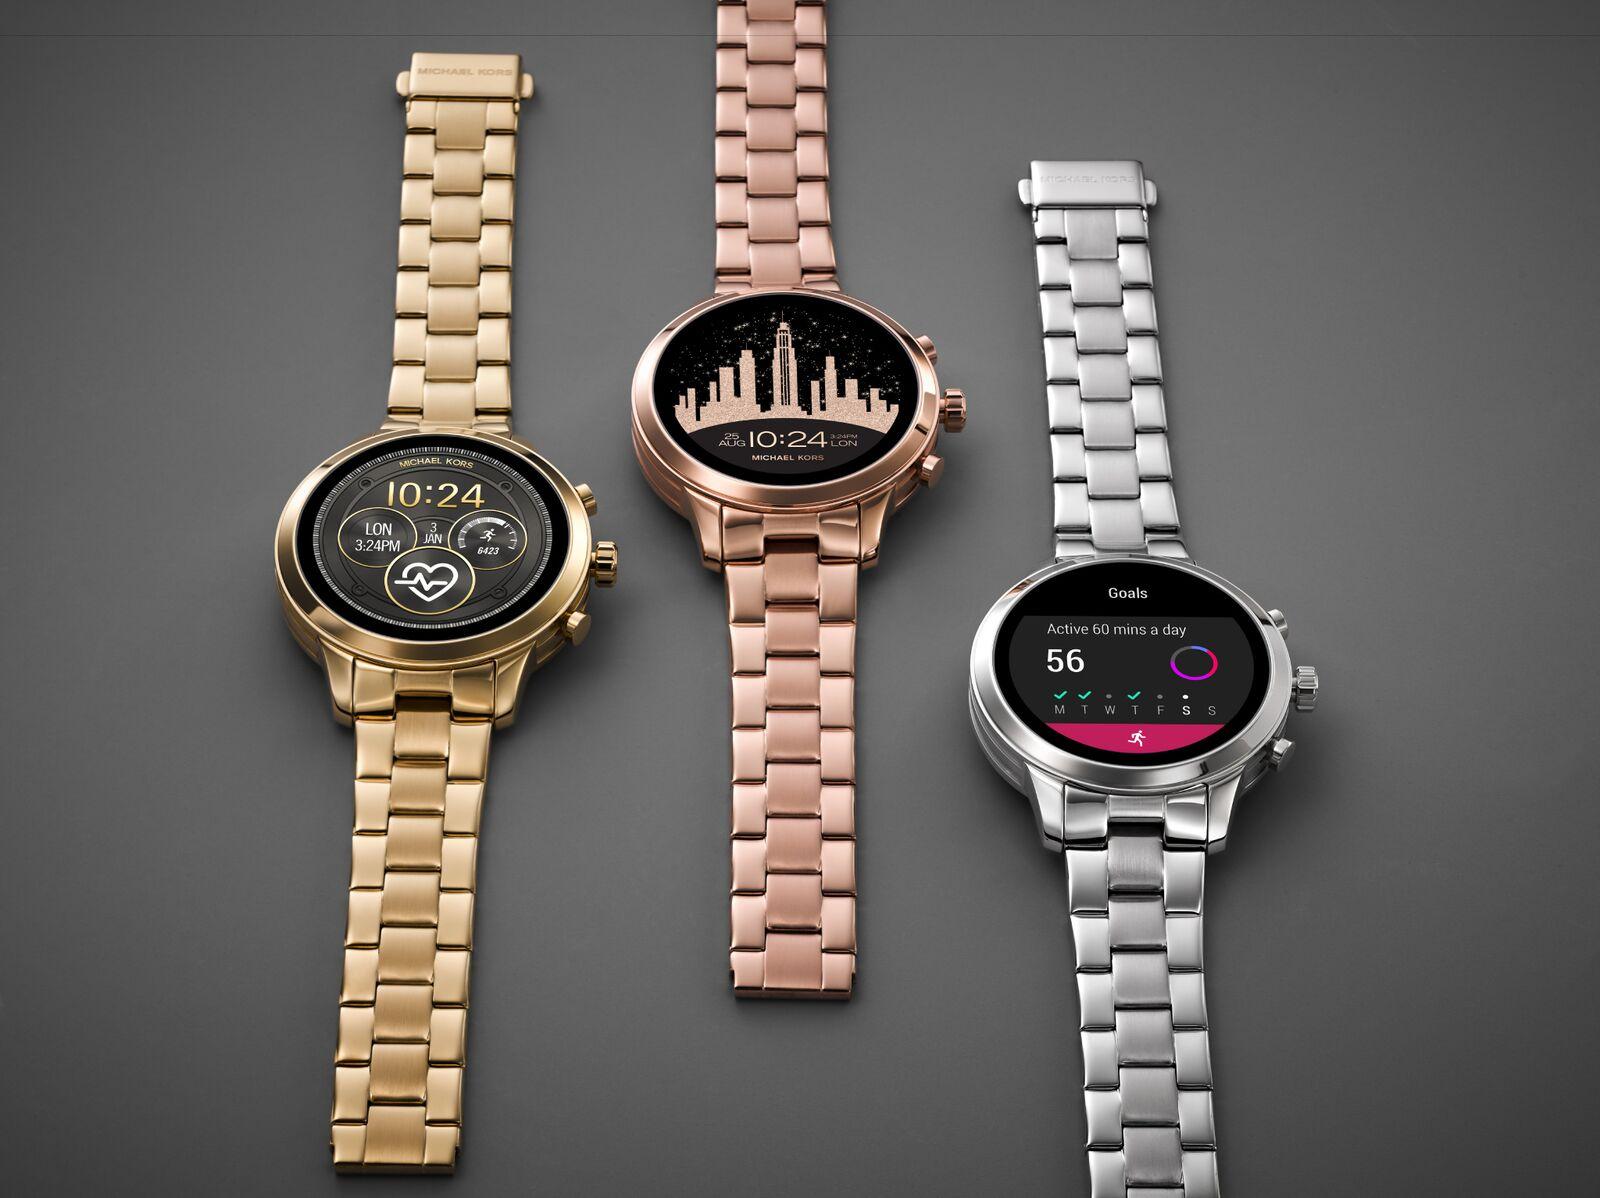 Michael Kors Access 推出智能觸屏腕錶 Runway 系列新色彩   Qooah